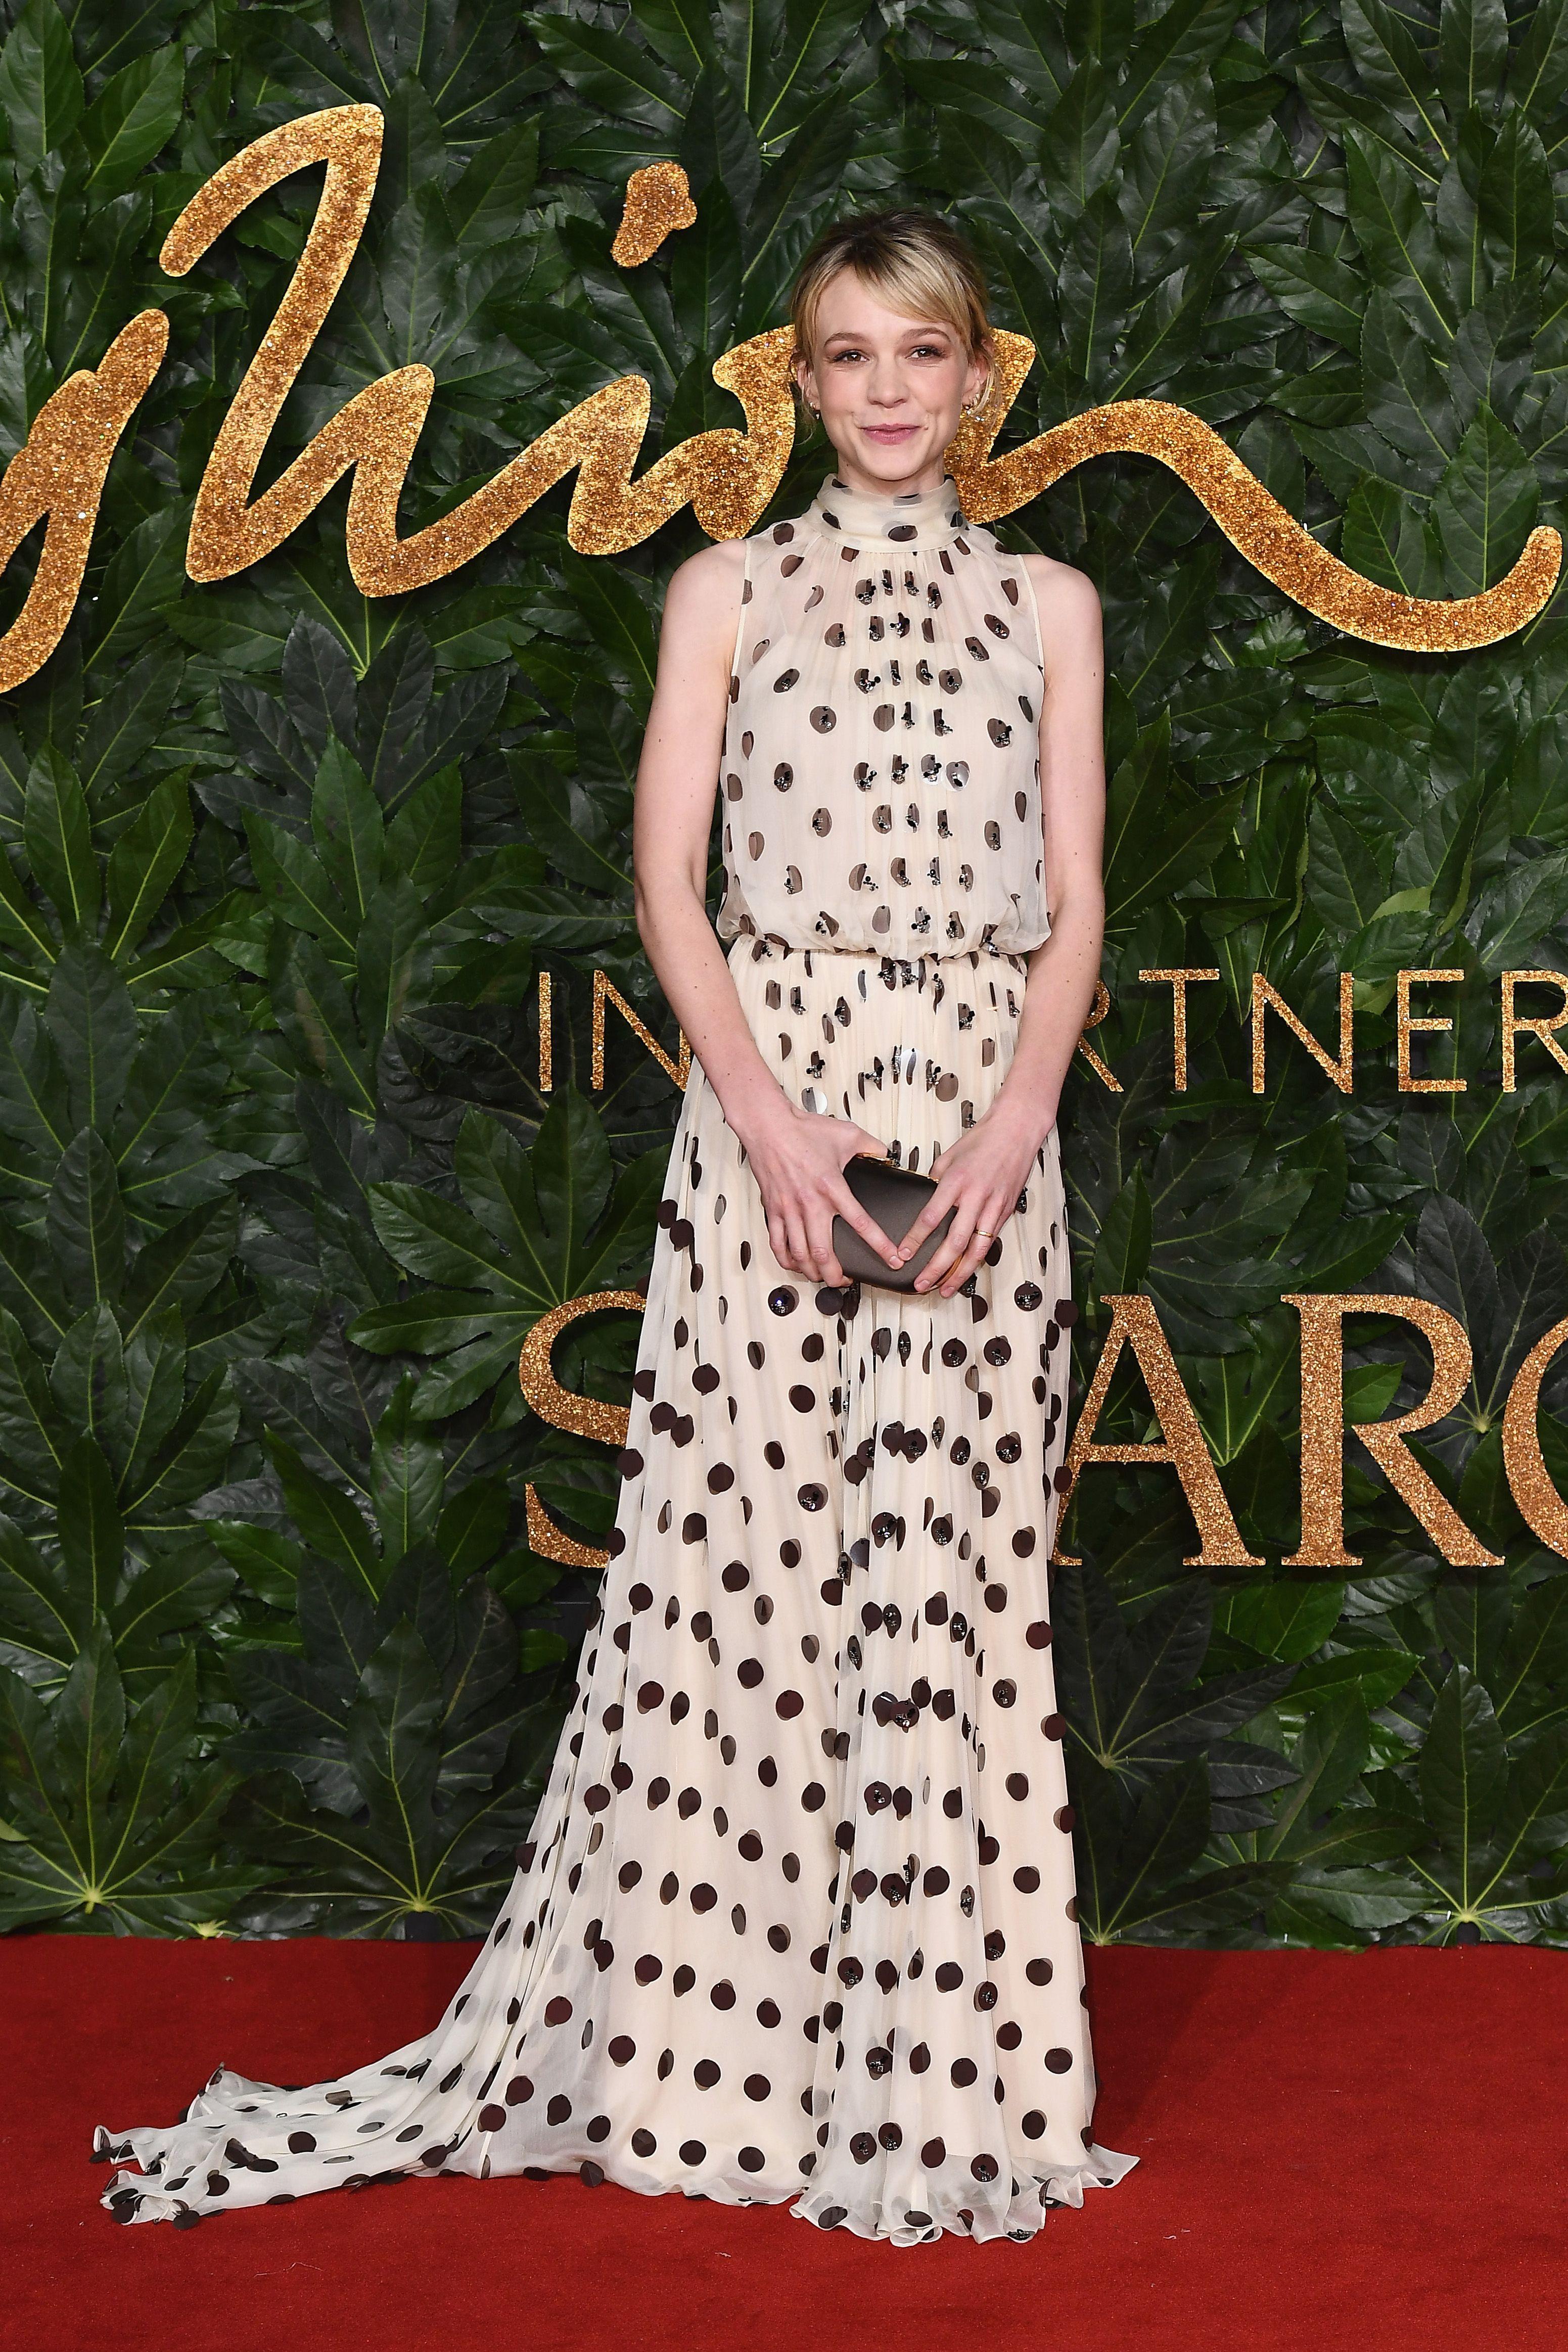 Fashion Awards 2018 Best Dressed Celebrities Red Carpet